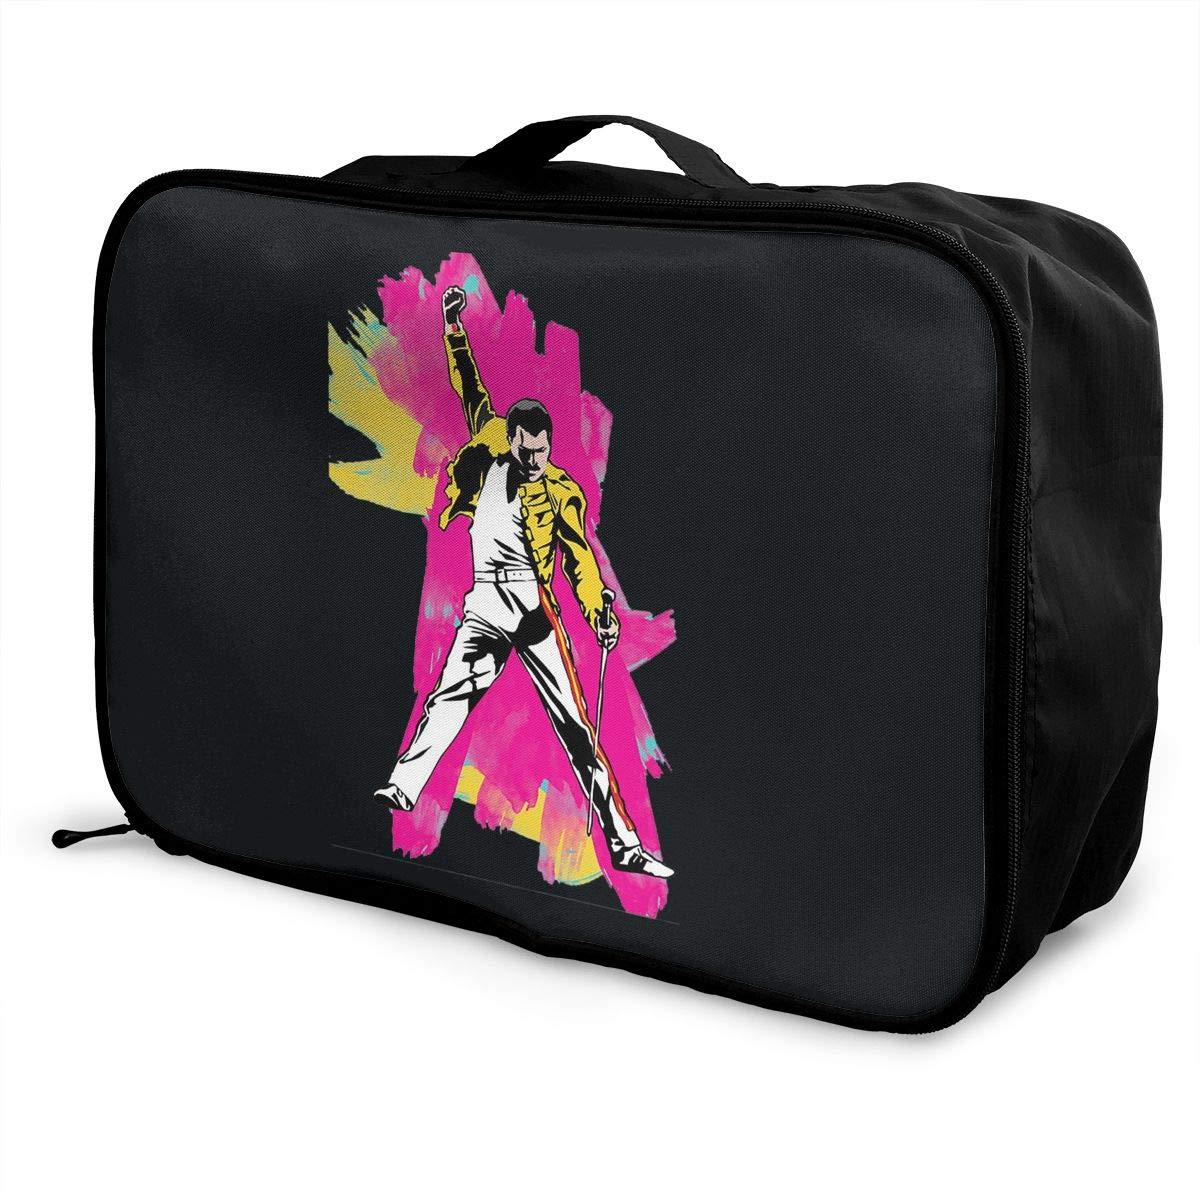 Mdaw232nda Travel Luggage Storage Bag,Packing Cubes Travel Duffel Bag Handle Makeup Bag Large Capacity Portable Luggage Bag